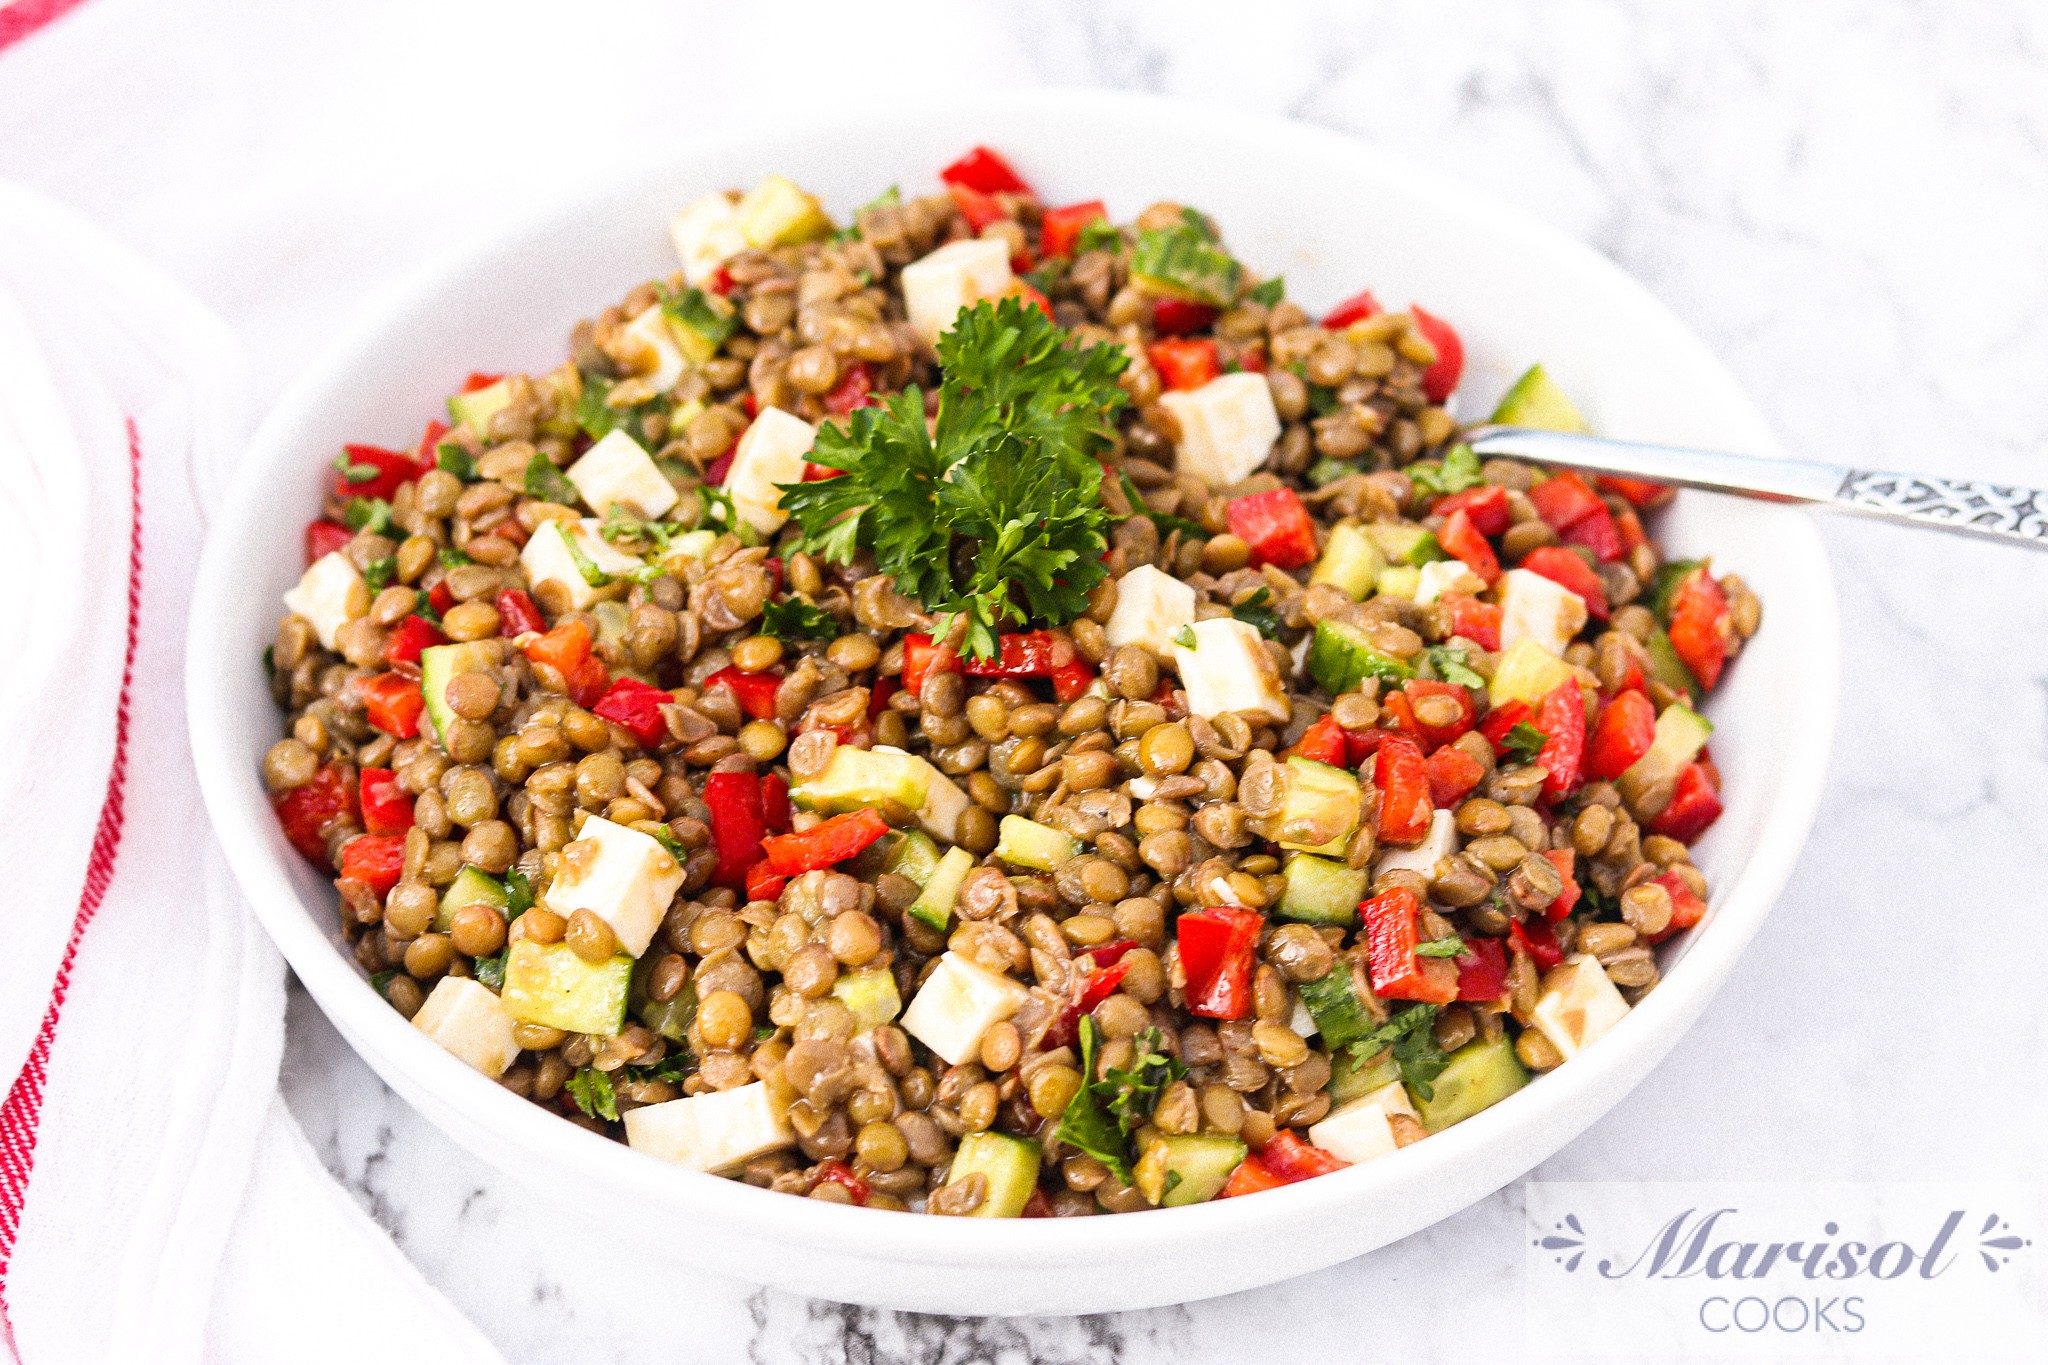 Lentil Salad with Balsamic Vinaigrette